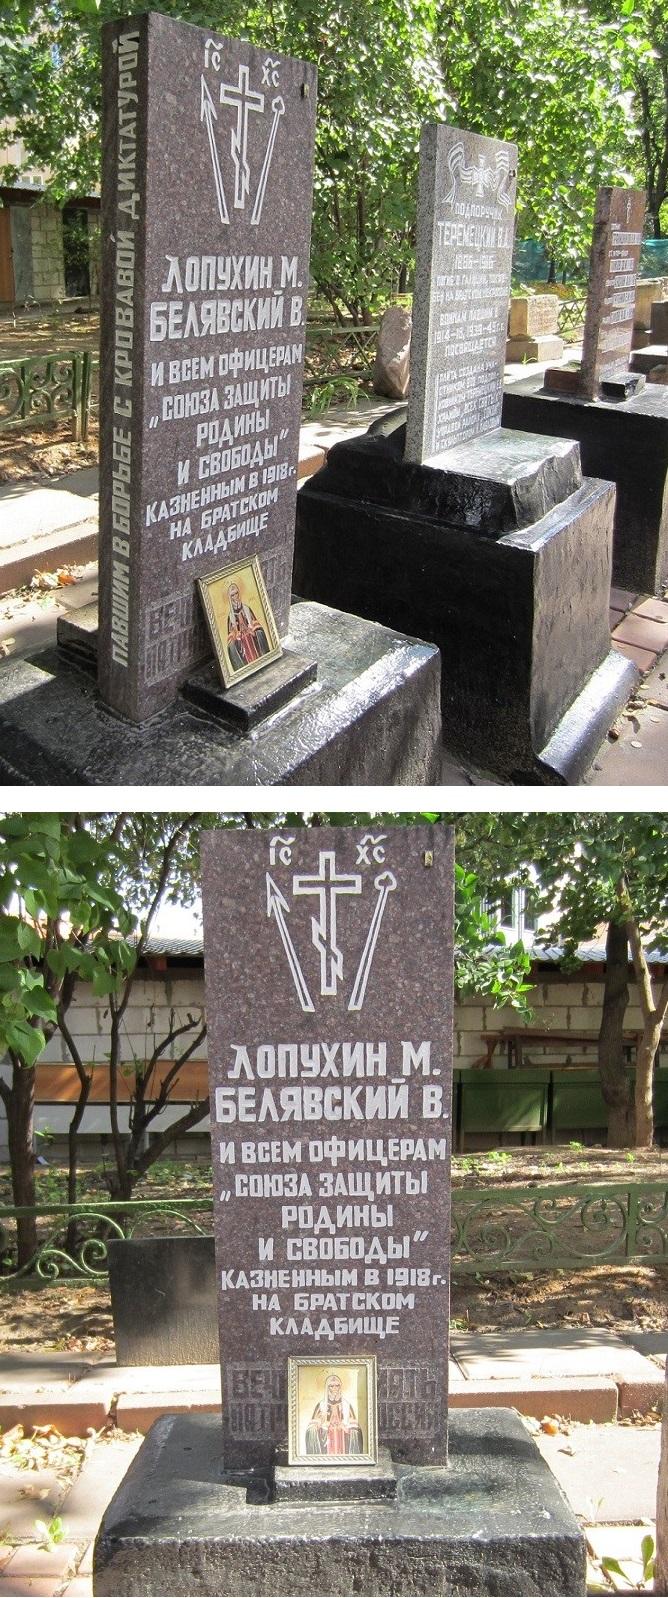 https://img-fotki.yandex.ru/get/15594/287625778.1/0_f88b8_5c5c4eda_orig.jpg